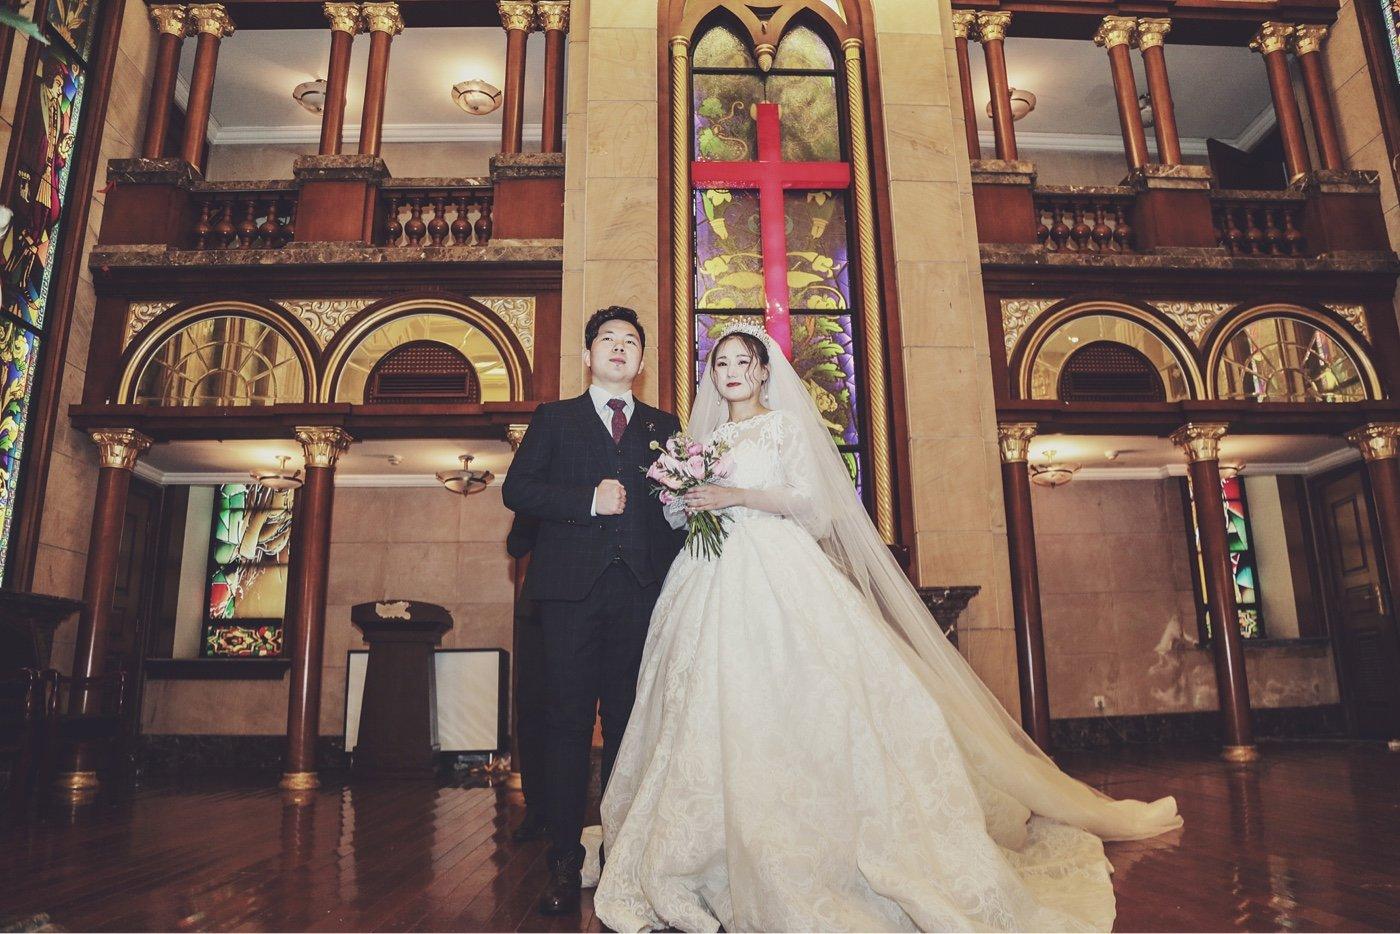 「Fantasy Wedding」&明珠教堂⛪8